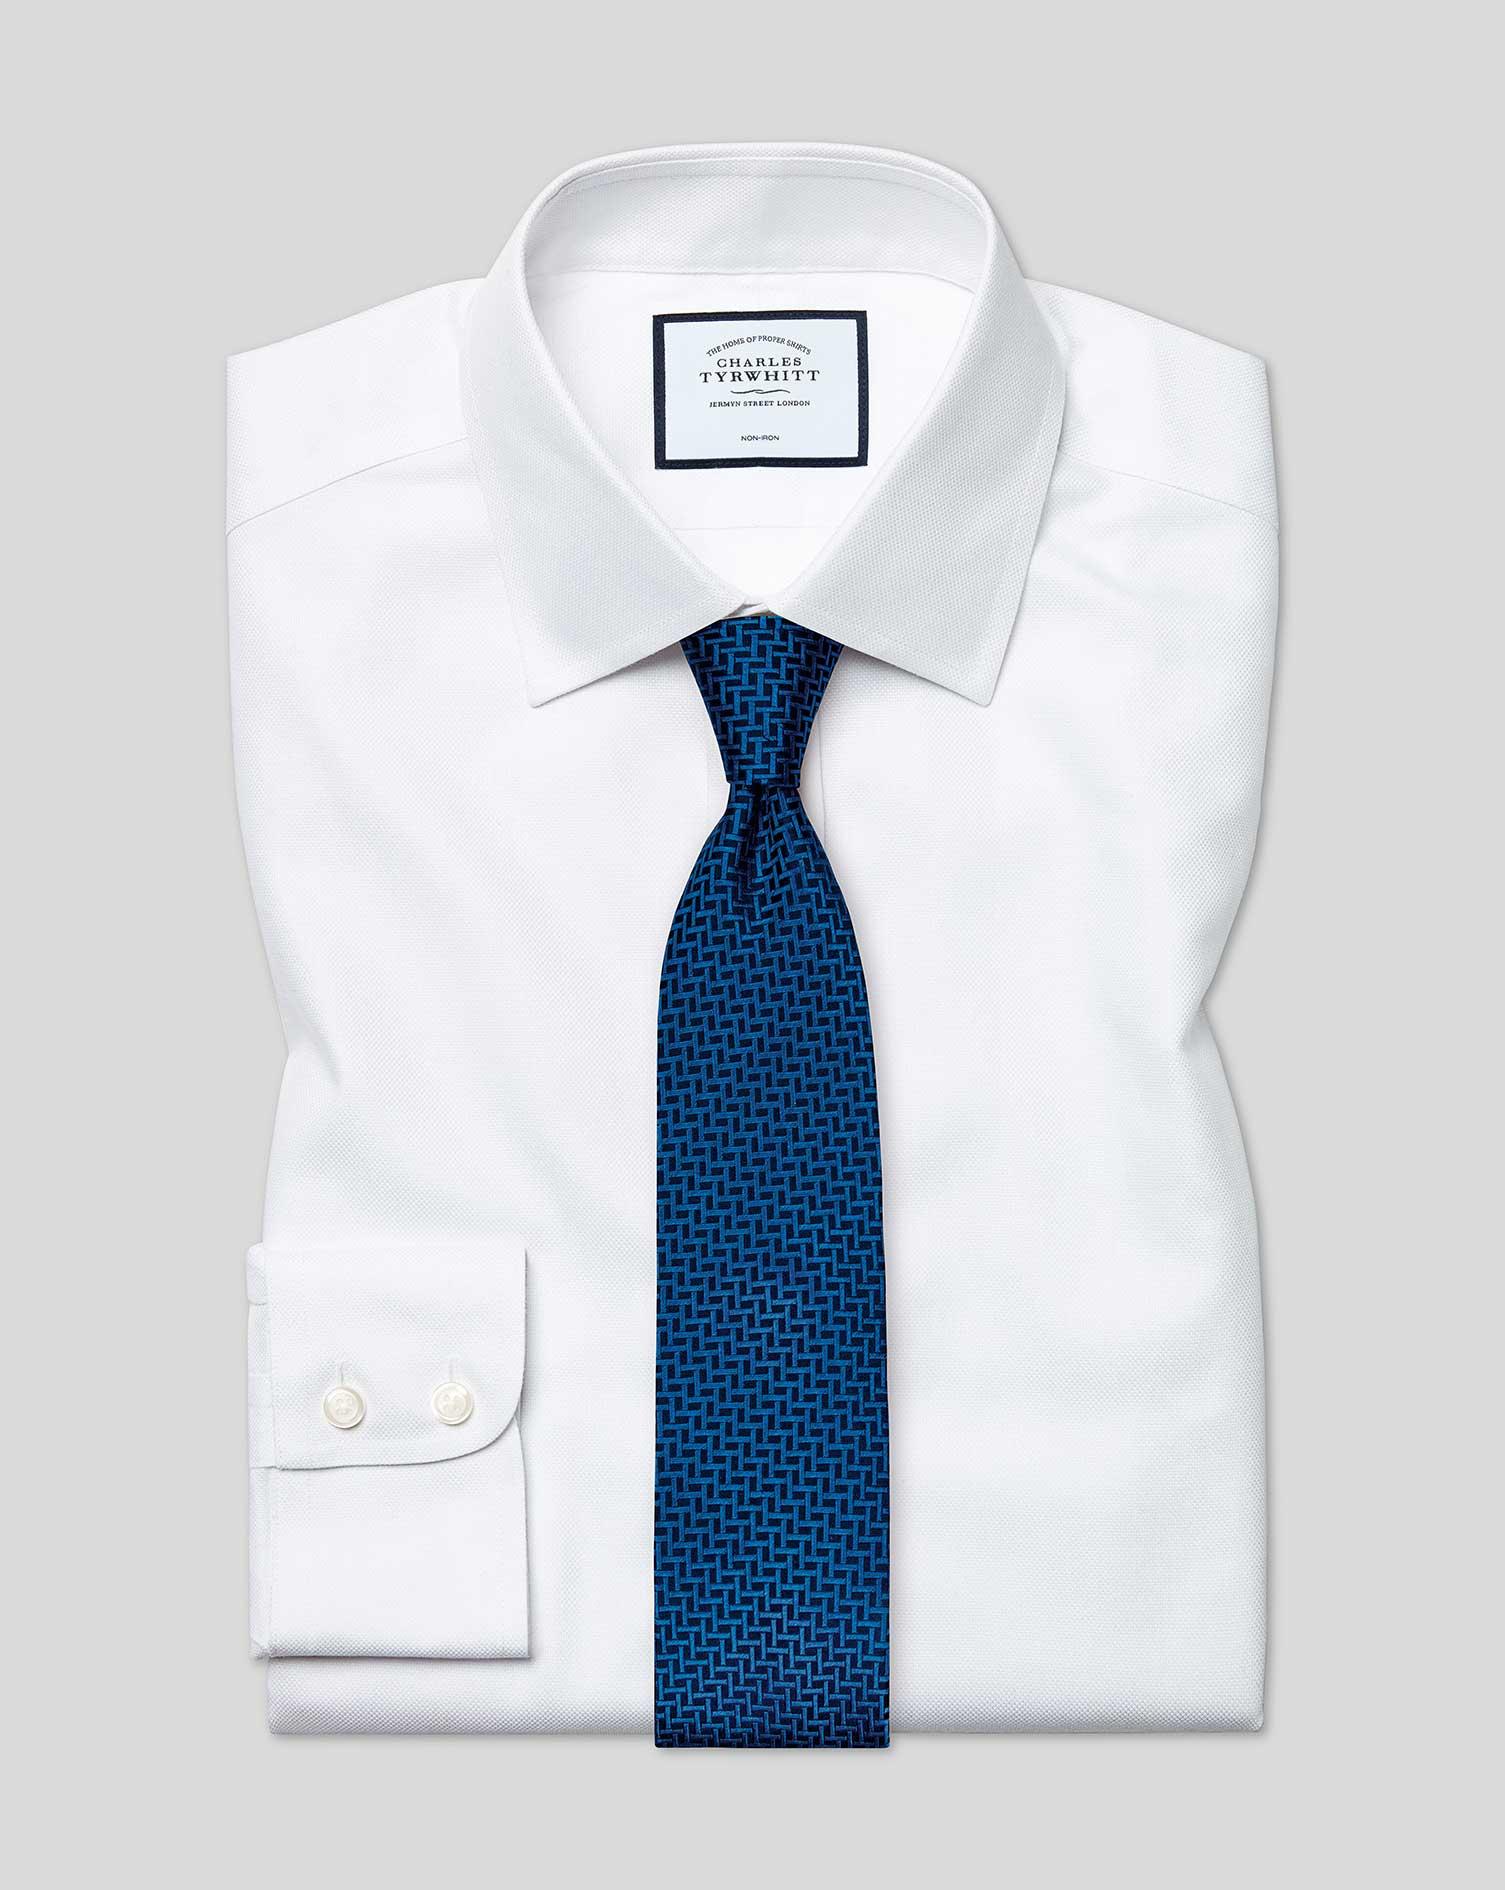 Cotton Classic Collar Non-Iron Royal Oxford Shirt - White